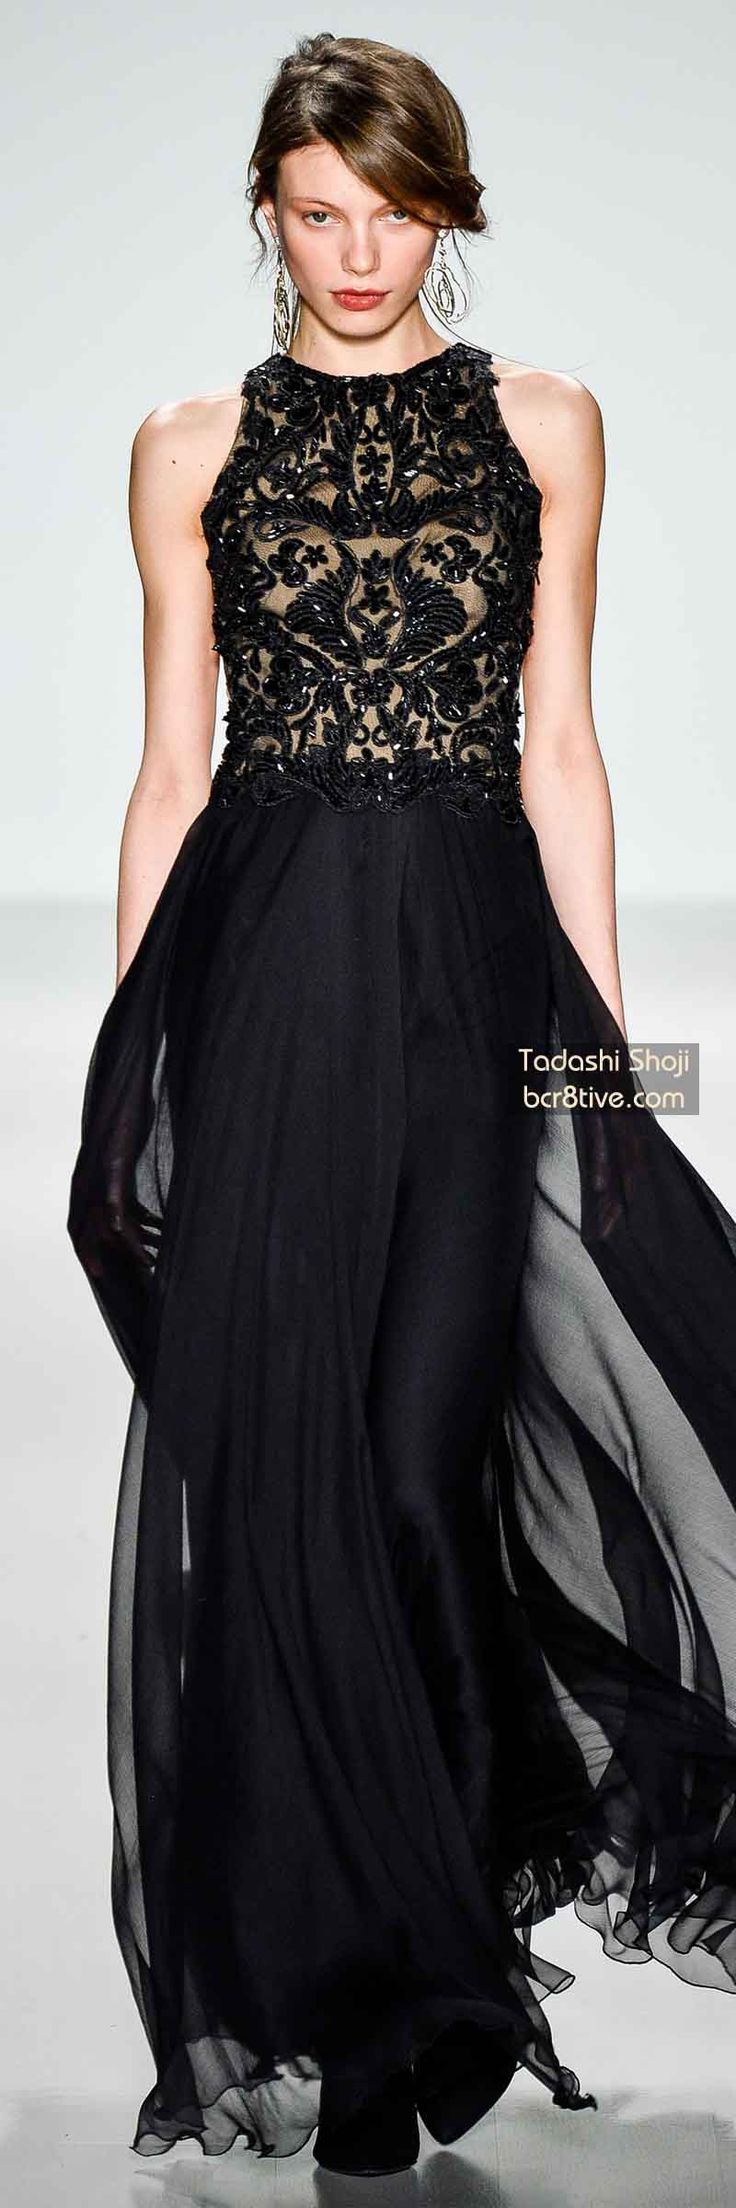 best fashion black images on pinterest high fashion black